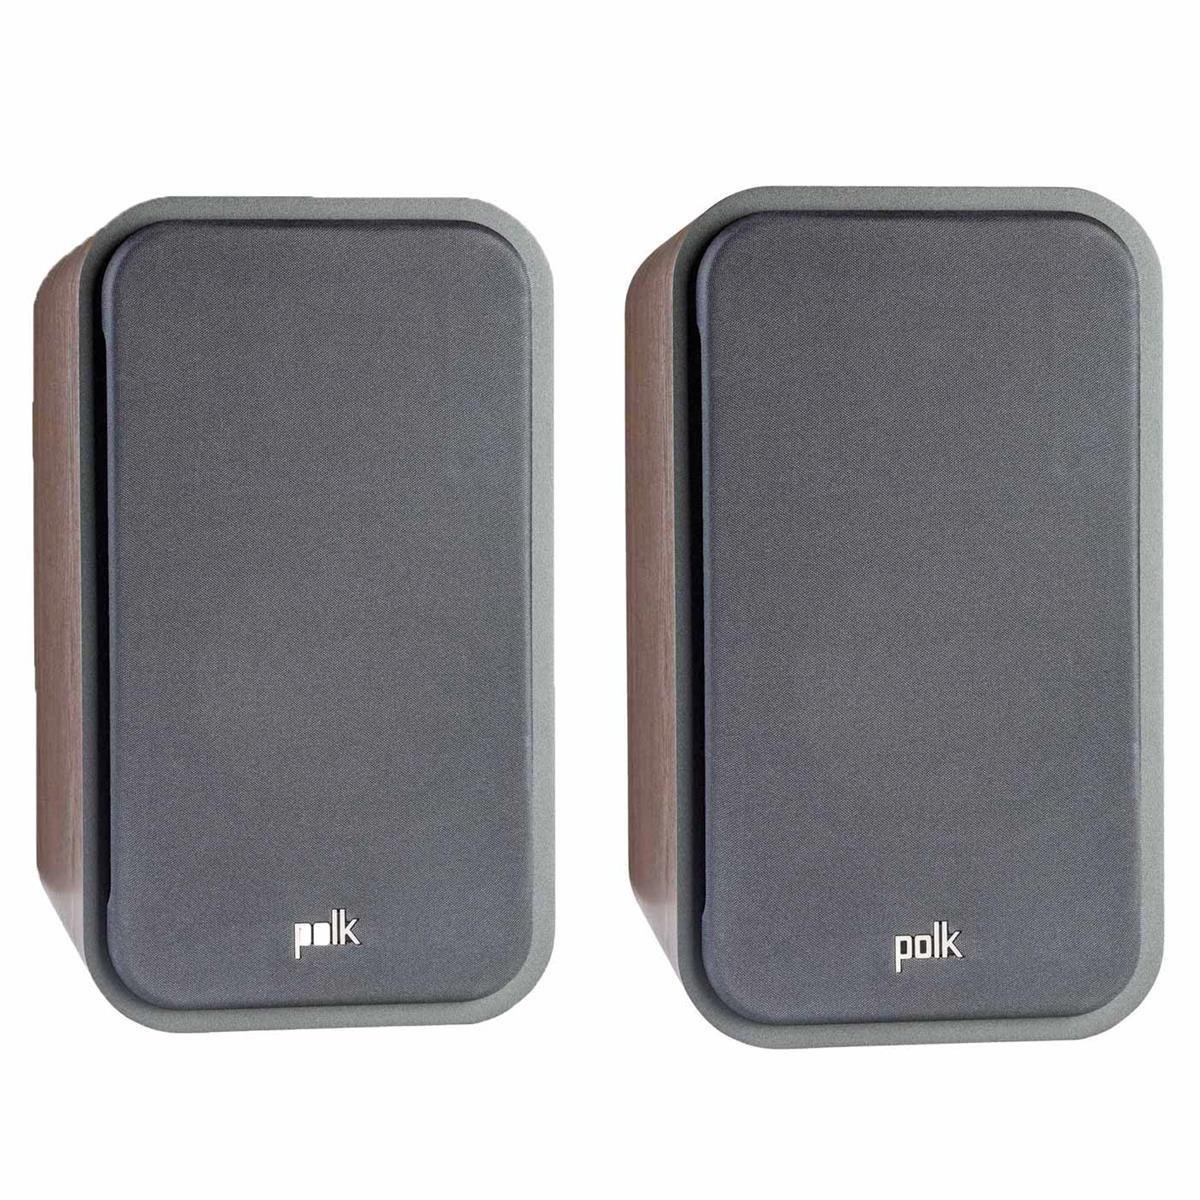 Polk Audio Signature Series S20 American Hi-Fi Home Theater Large Bookshelf Speakers - Pair (Classic Brown Walnut) by Polk Audio